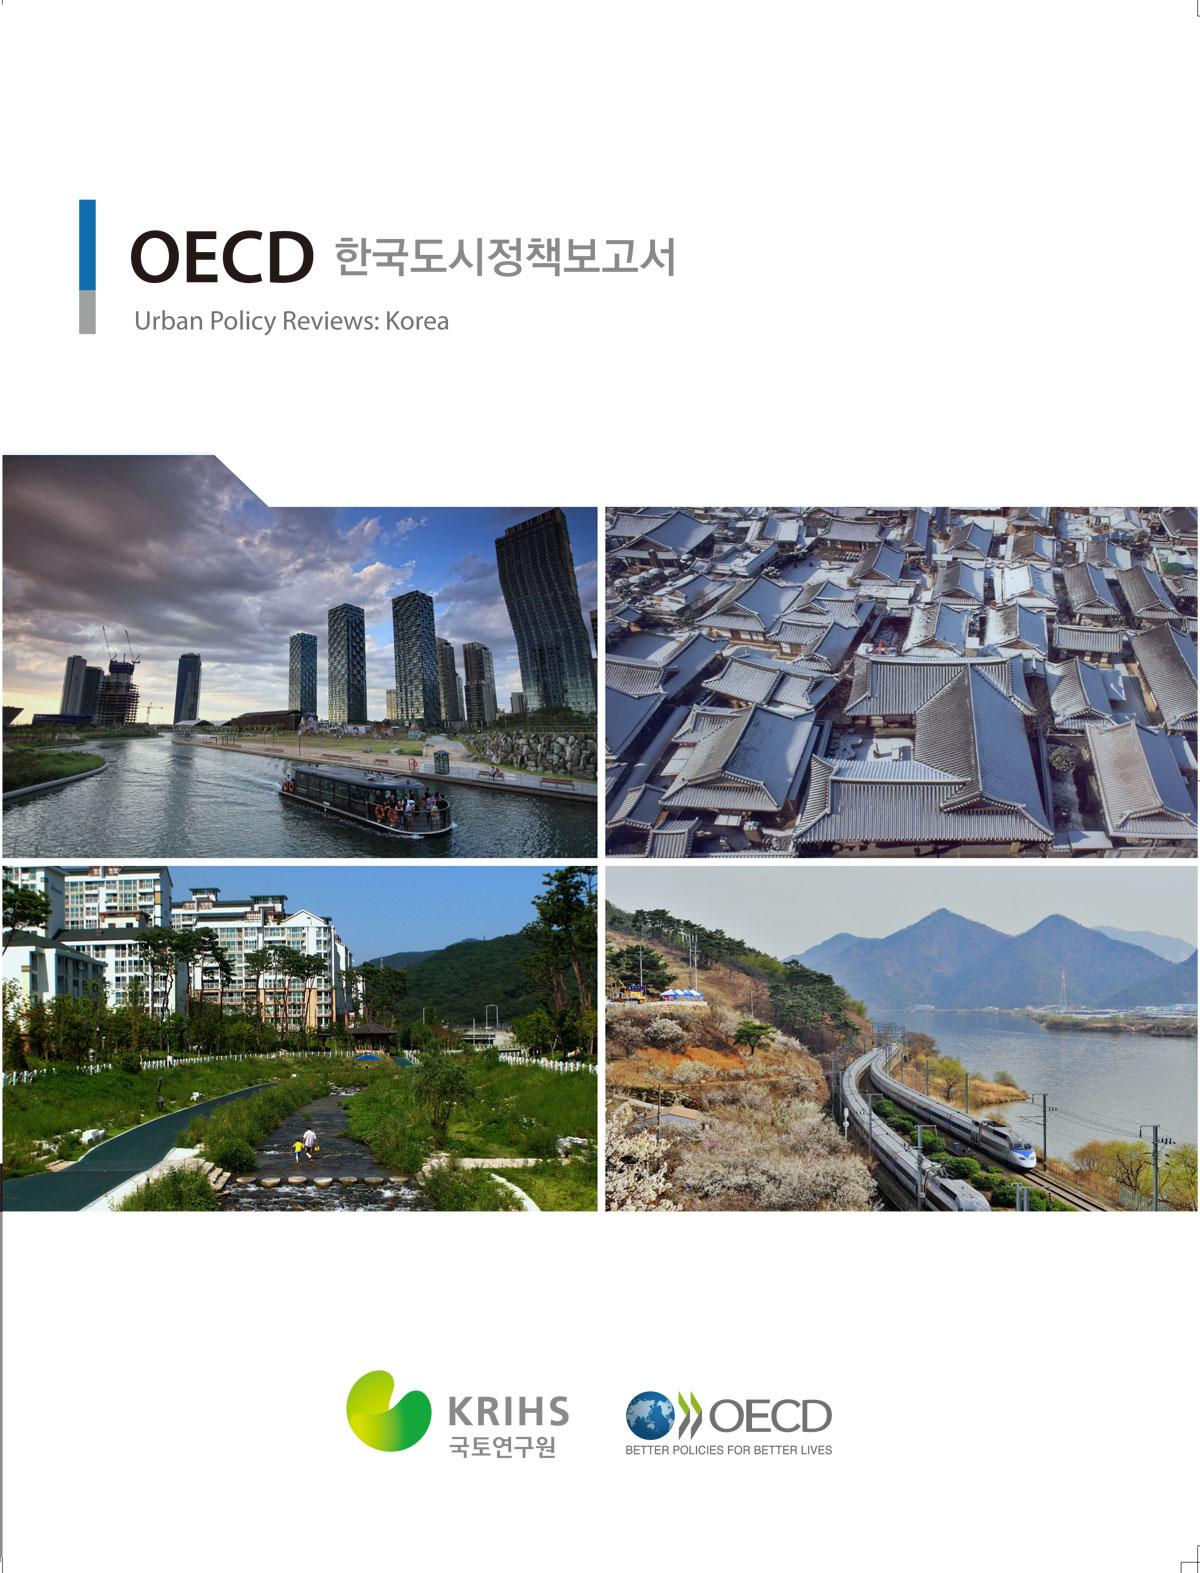 OECD 한국도시정책보고서표지